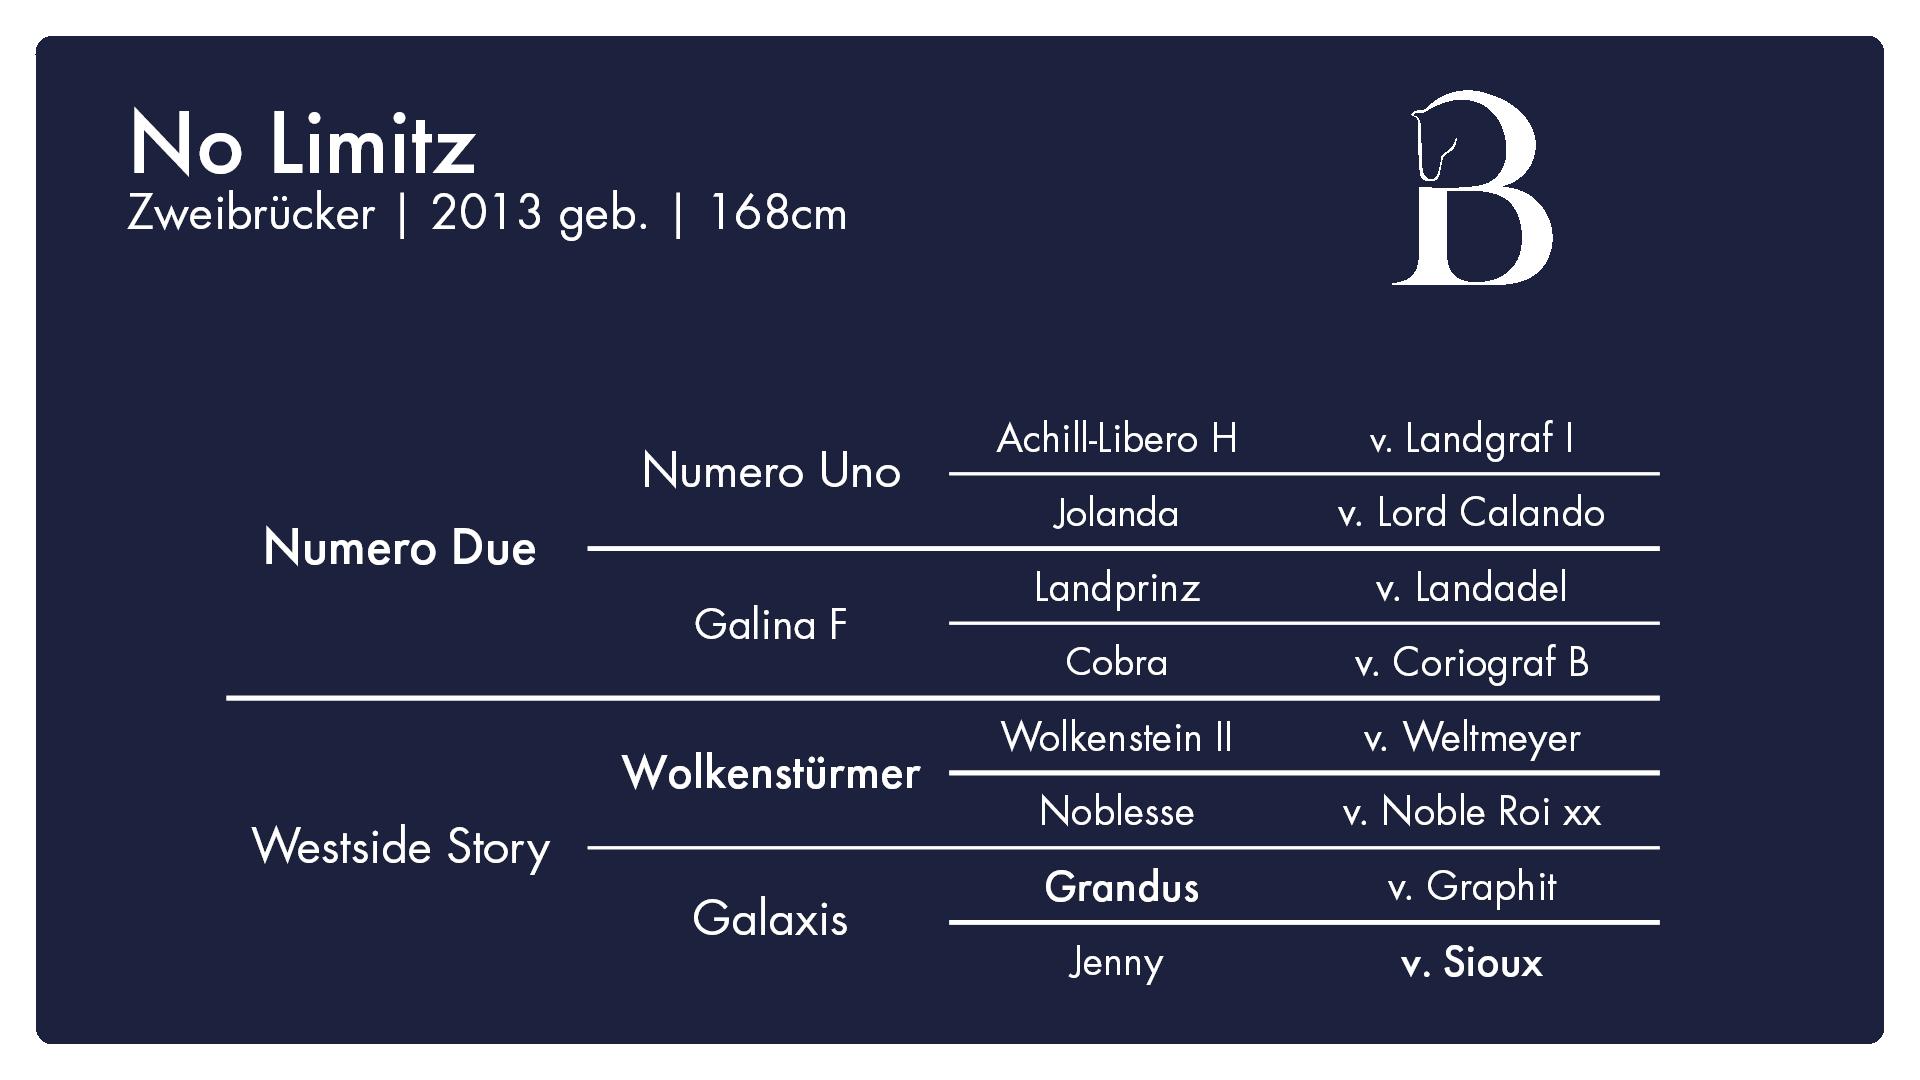 No Limitz - 1. Burghof-Online-Hengstschau